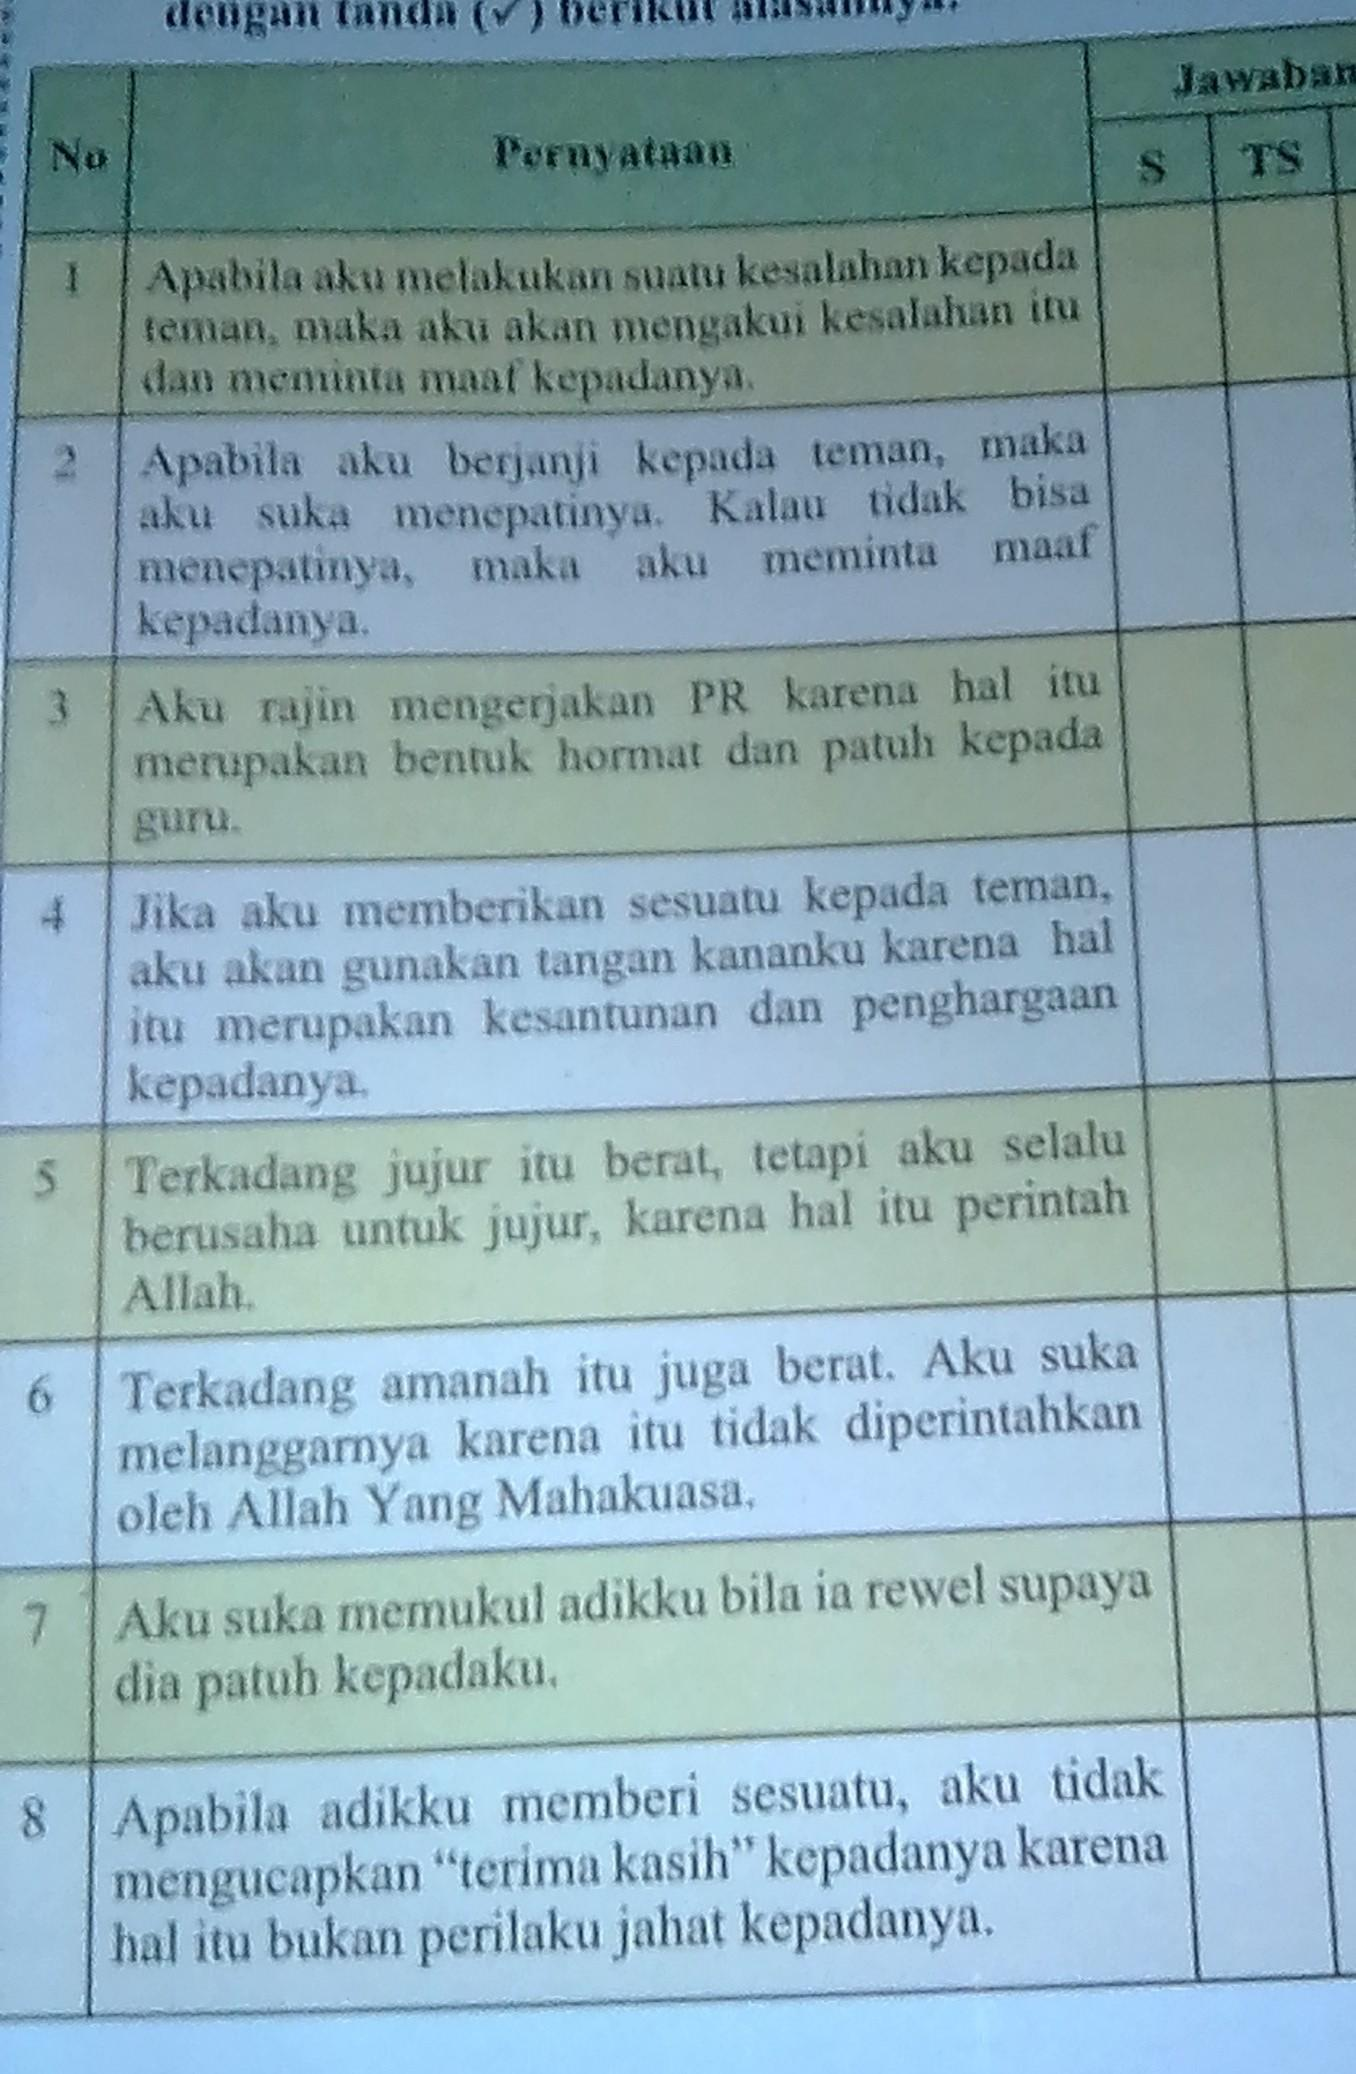 Kunci jawaban pendidikan agama islam dan budi pekerti (pai) kelas 4 kunci. Jawaban Halaman 33 Kelas 4 Kurikulum 2013 Mapel Agama Islam Brainly Co Id